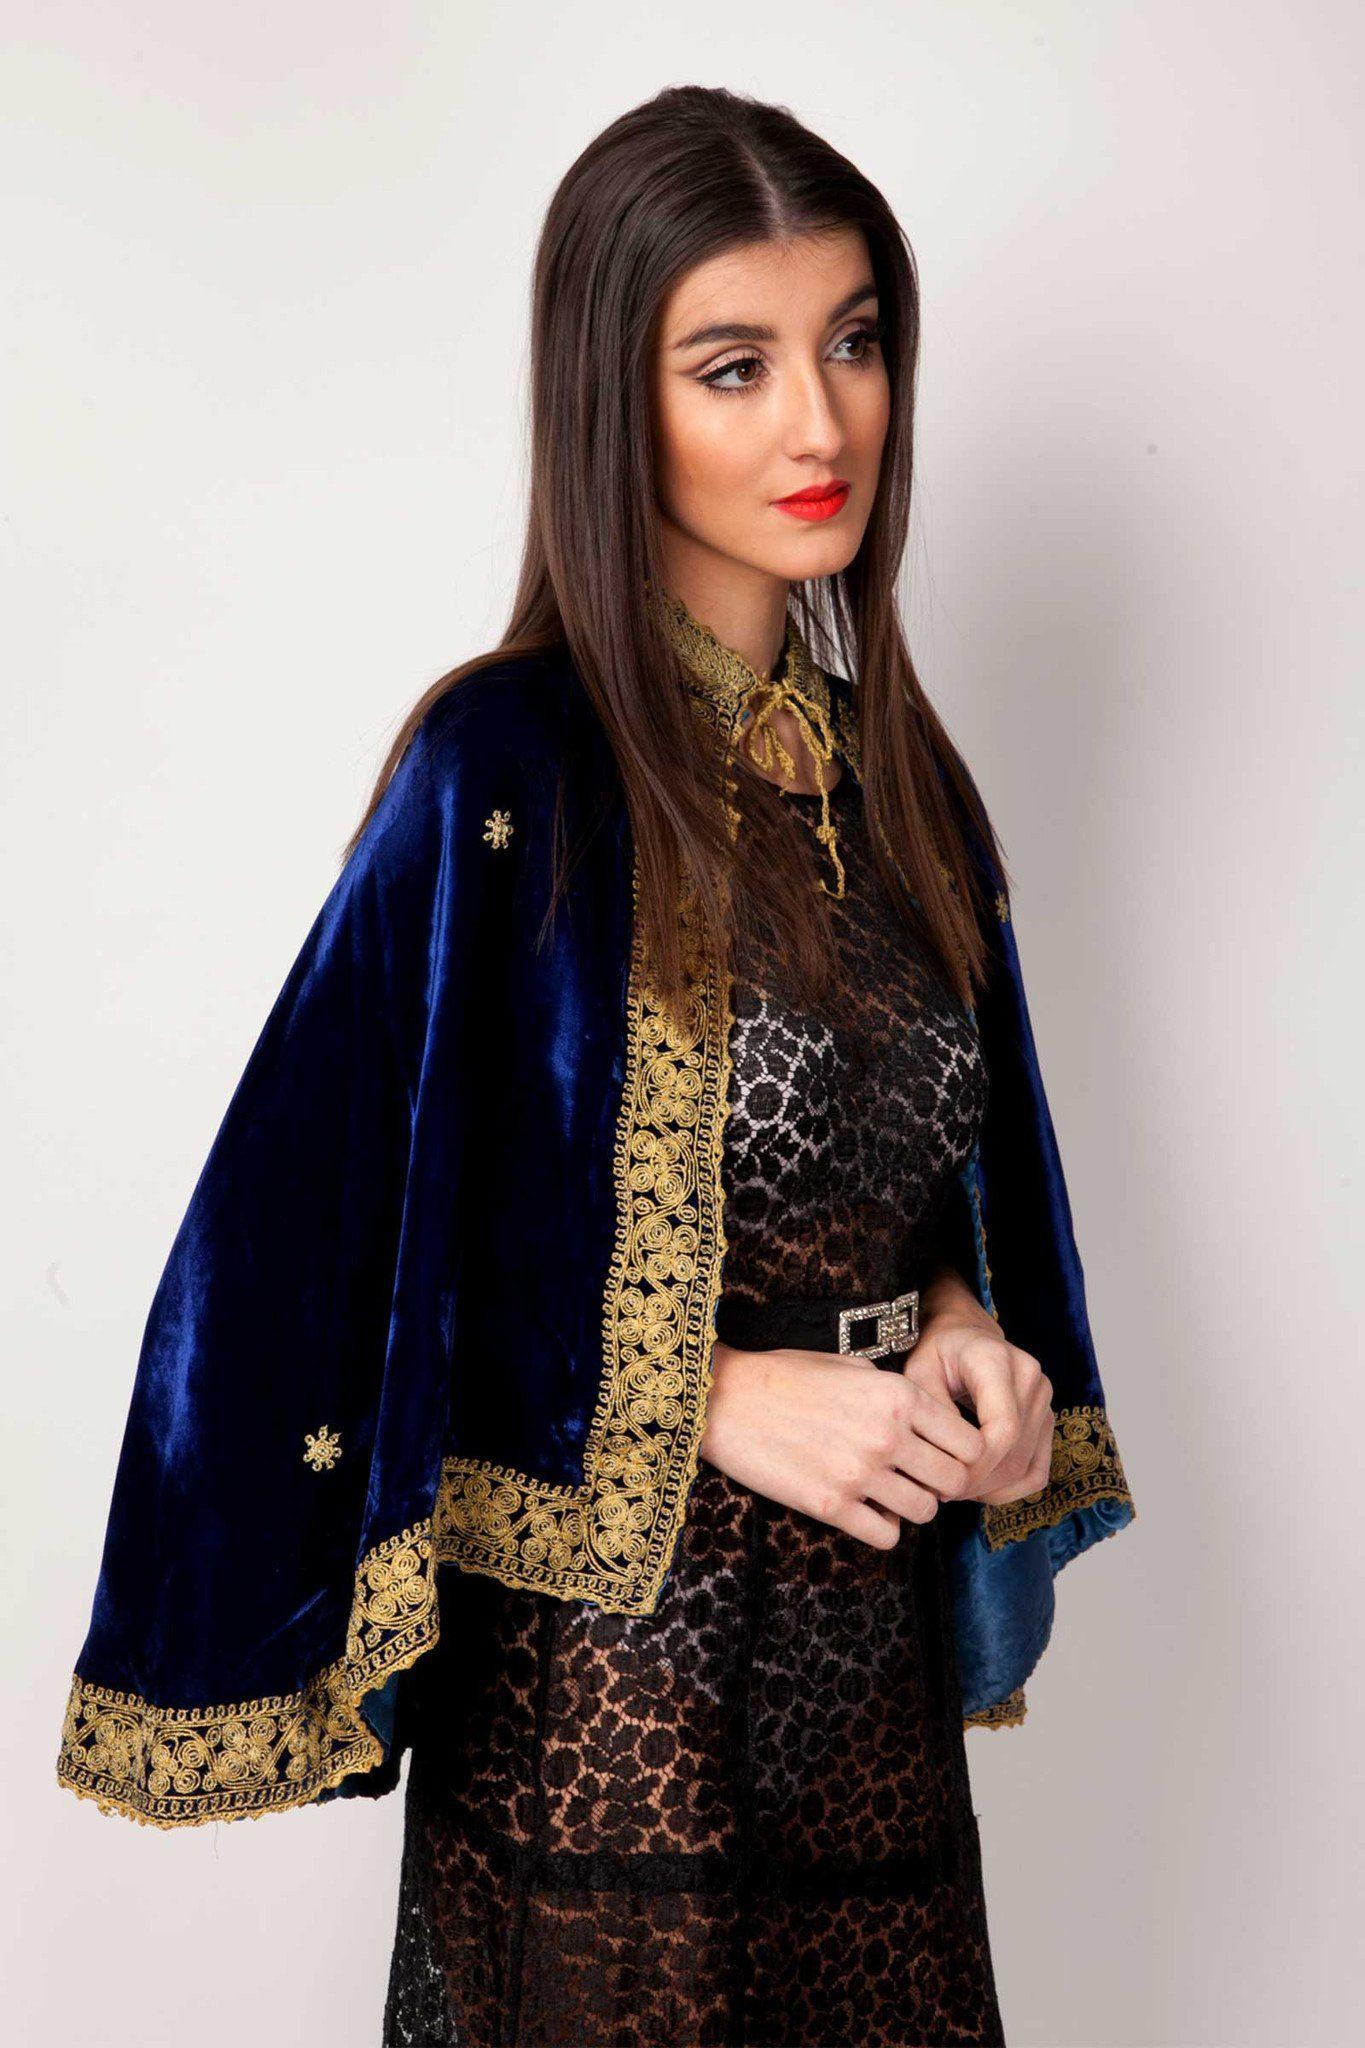 Raphaela cape ali mcgraw boho style pinterest cape retro